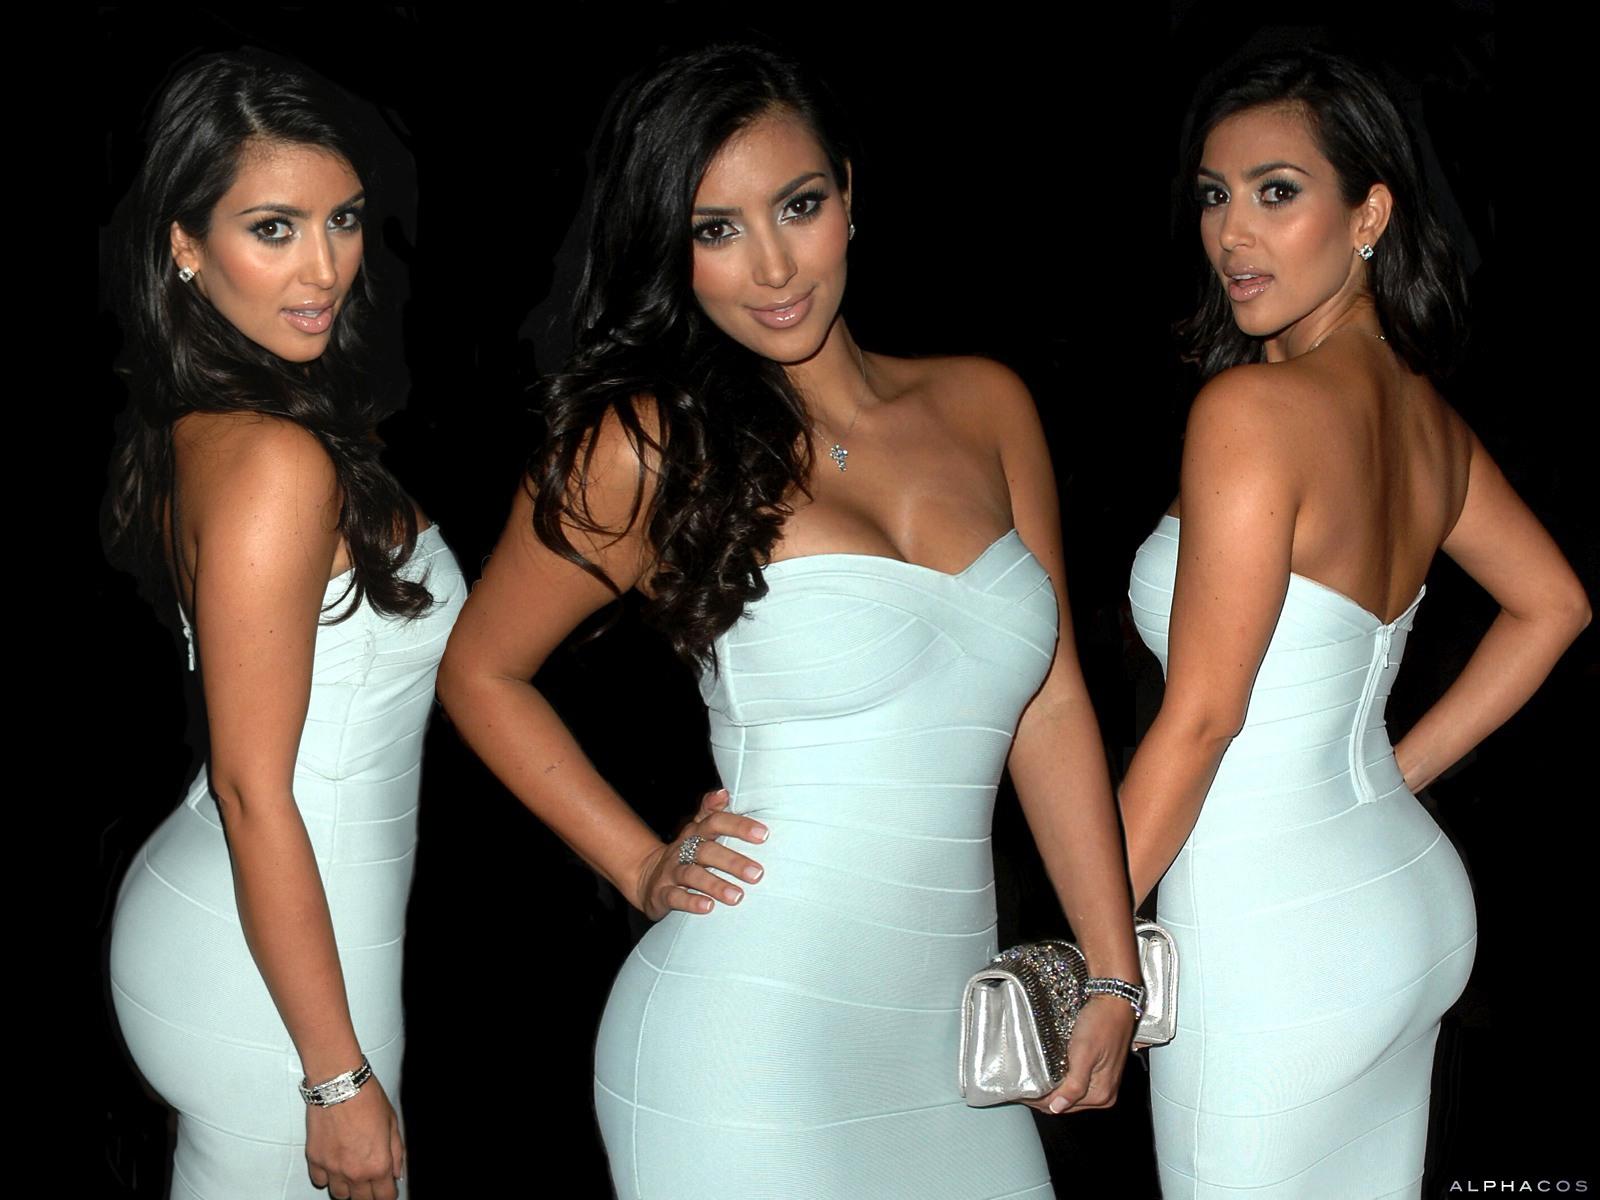 http://4.bp.blogspot.com/_3OVUBipput8/TMkOPKvwVuI/AAAAAAAAB0E/bkVpK5-Q45s/s1600/kim-kardashian-4.jpg